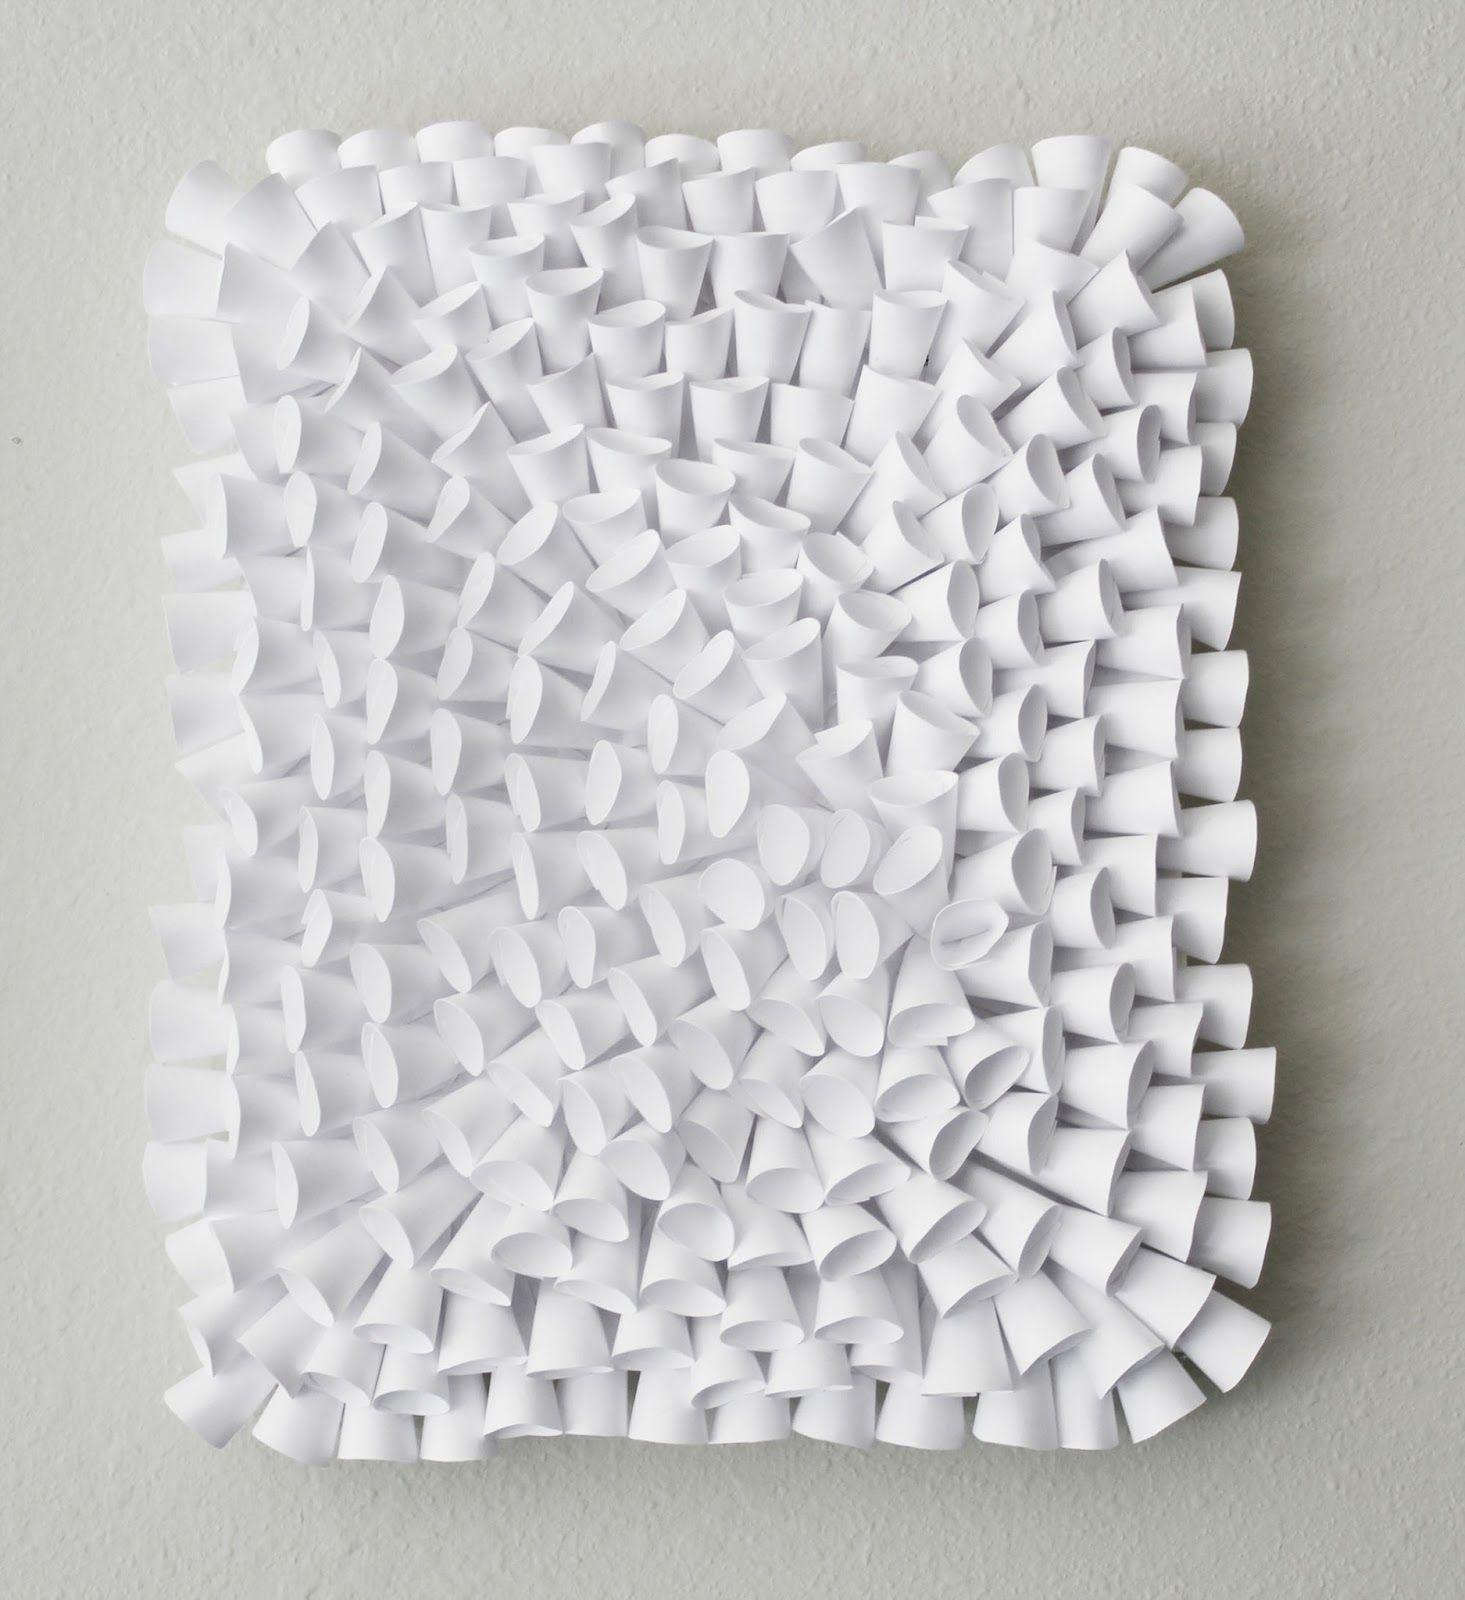 ₪ Paper Art Potpourri ₪  Momichka: White Paper Sculpture - CORAL REEF